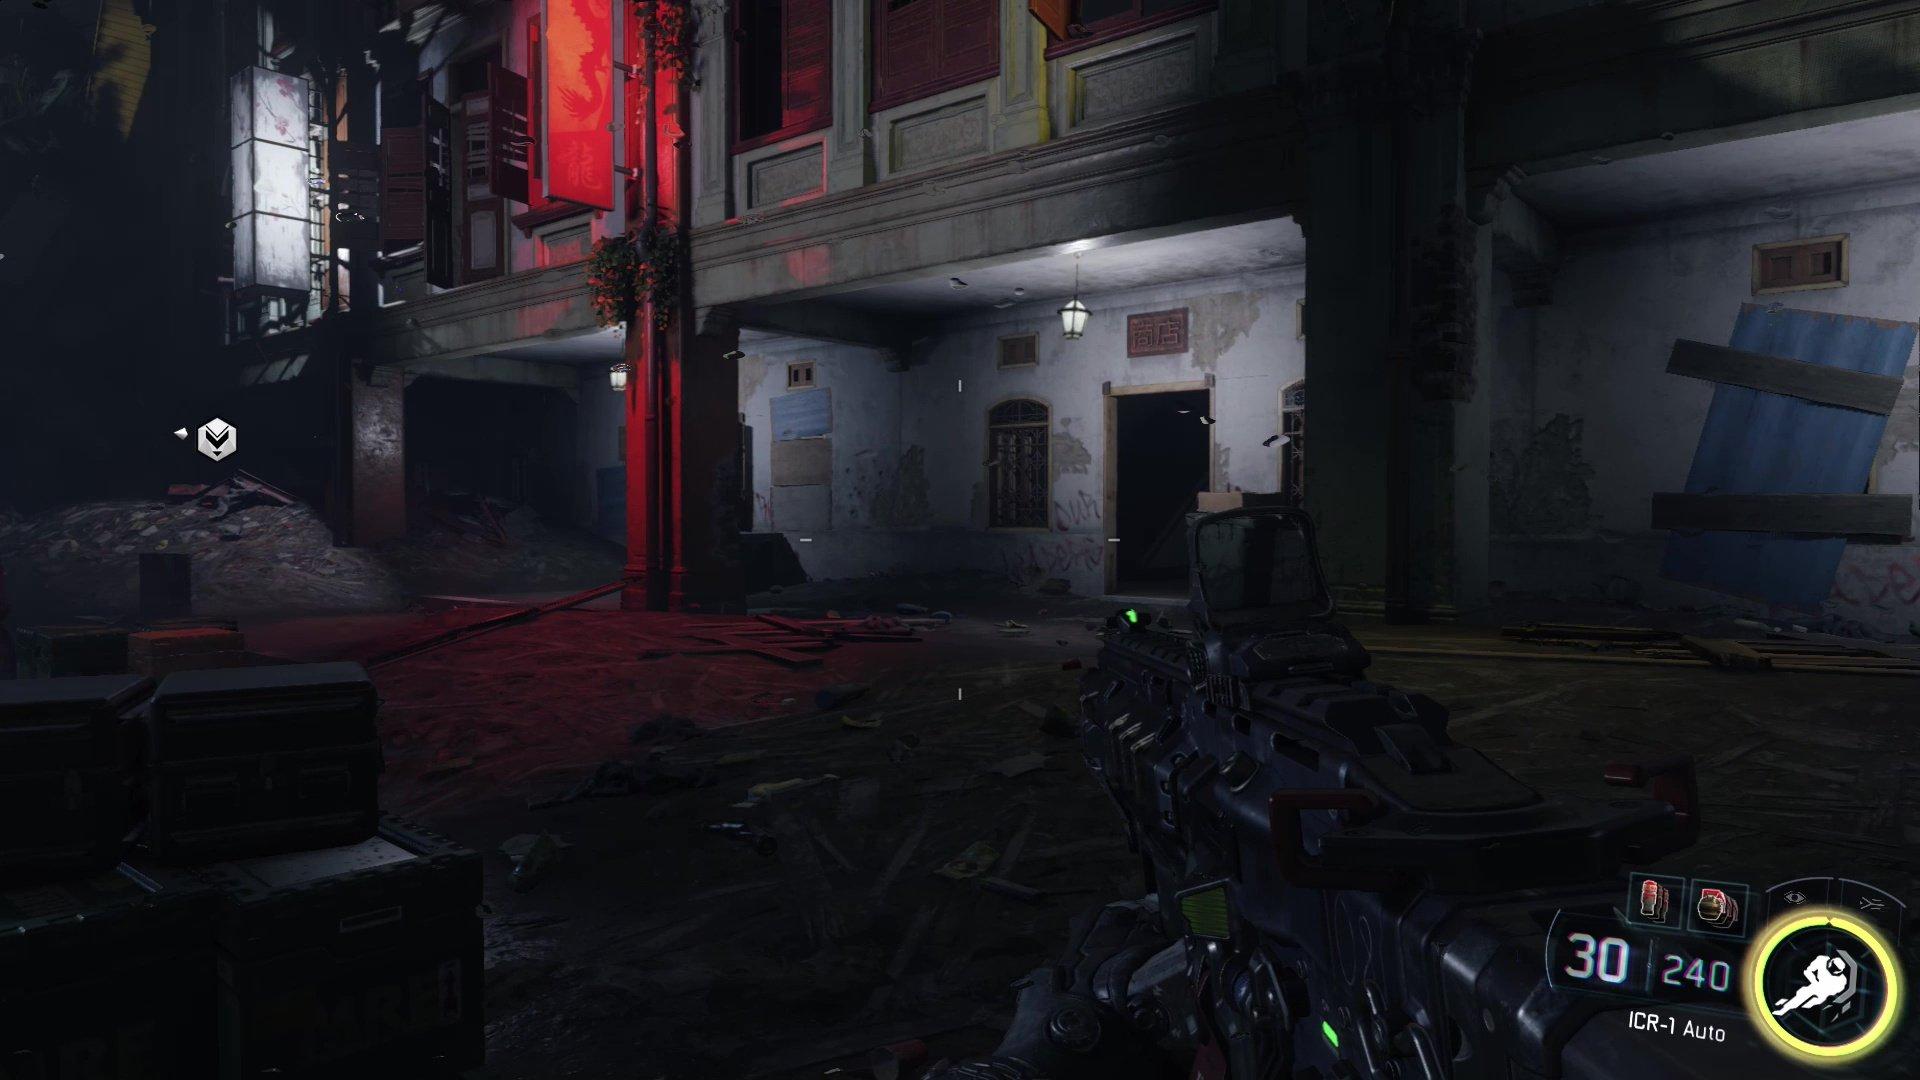 CoD Black Ops III